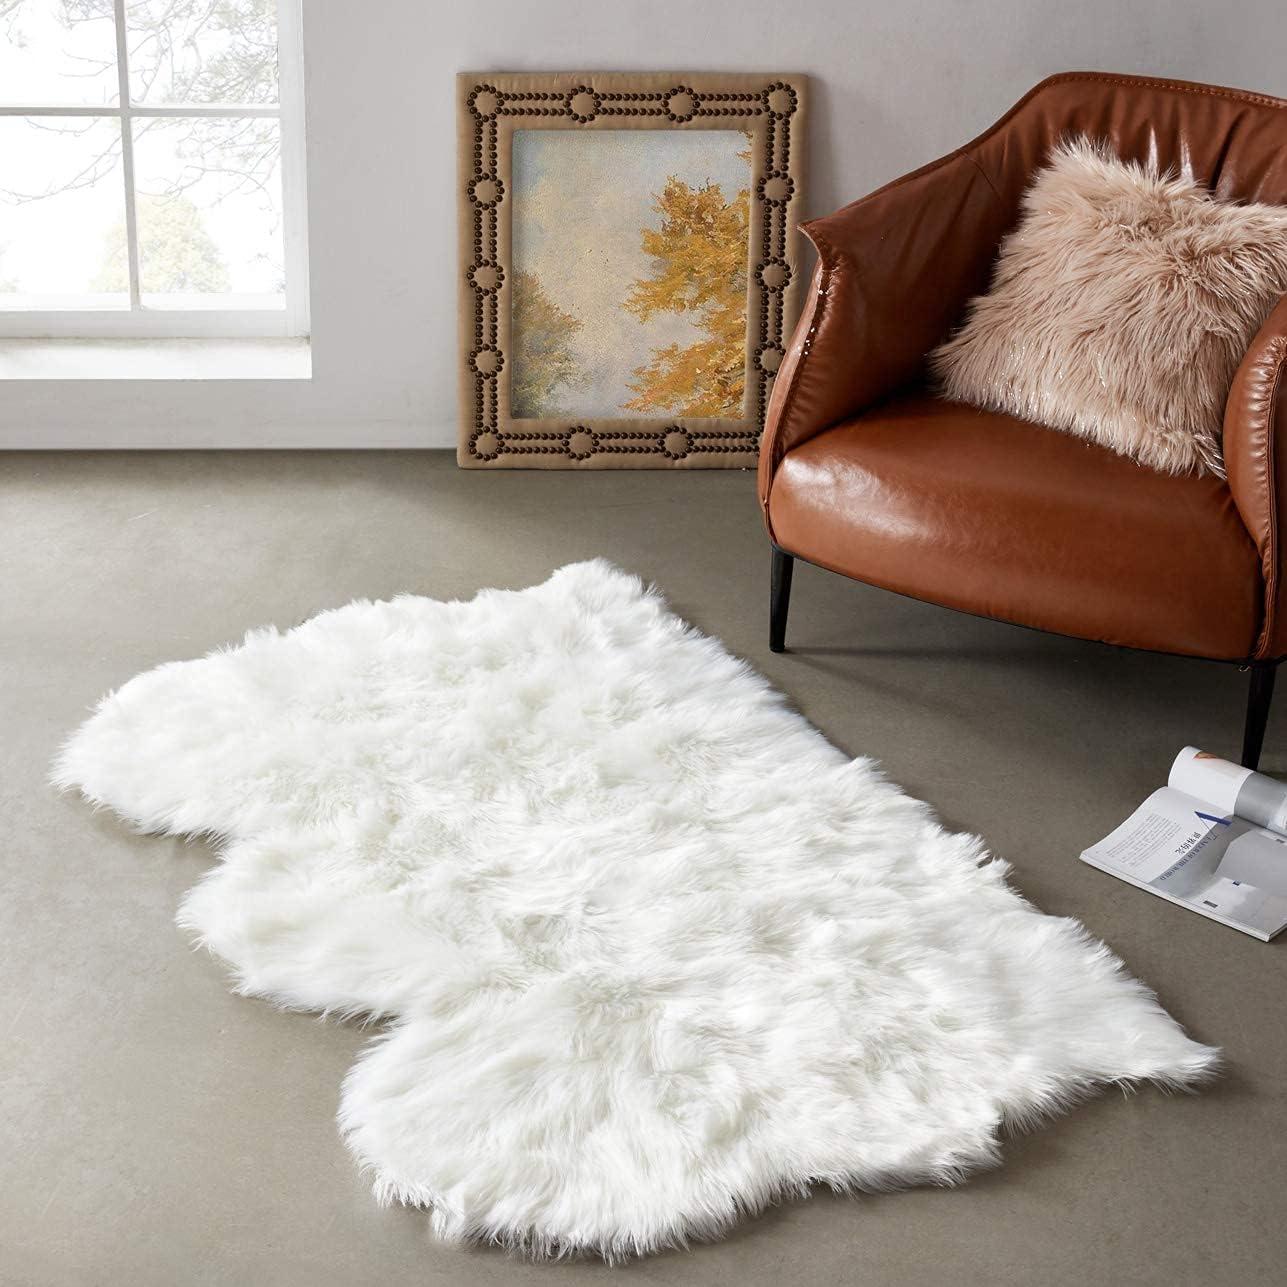 LEEVAN Plush Sheepskin Style Throw Rug Faux Fur Elegant Chic Style Cozy Shaggy Round Rug Floor Mat Area Rugs Home Decorator Super Soft Carpets Kids Play Rug (3 ft x 5 ft Sheepskin, White)